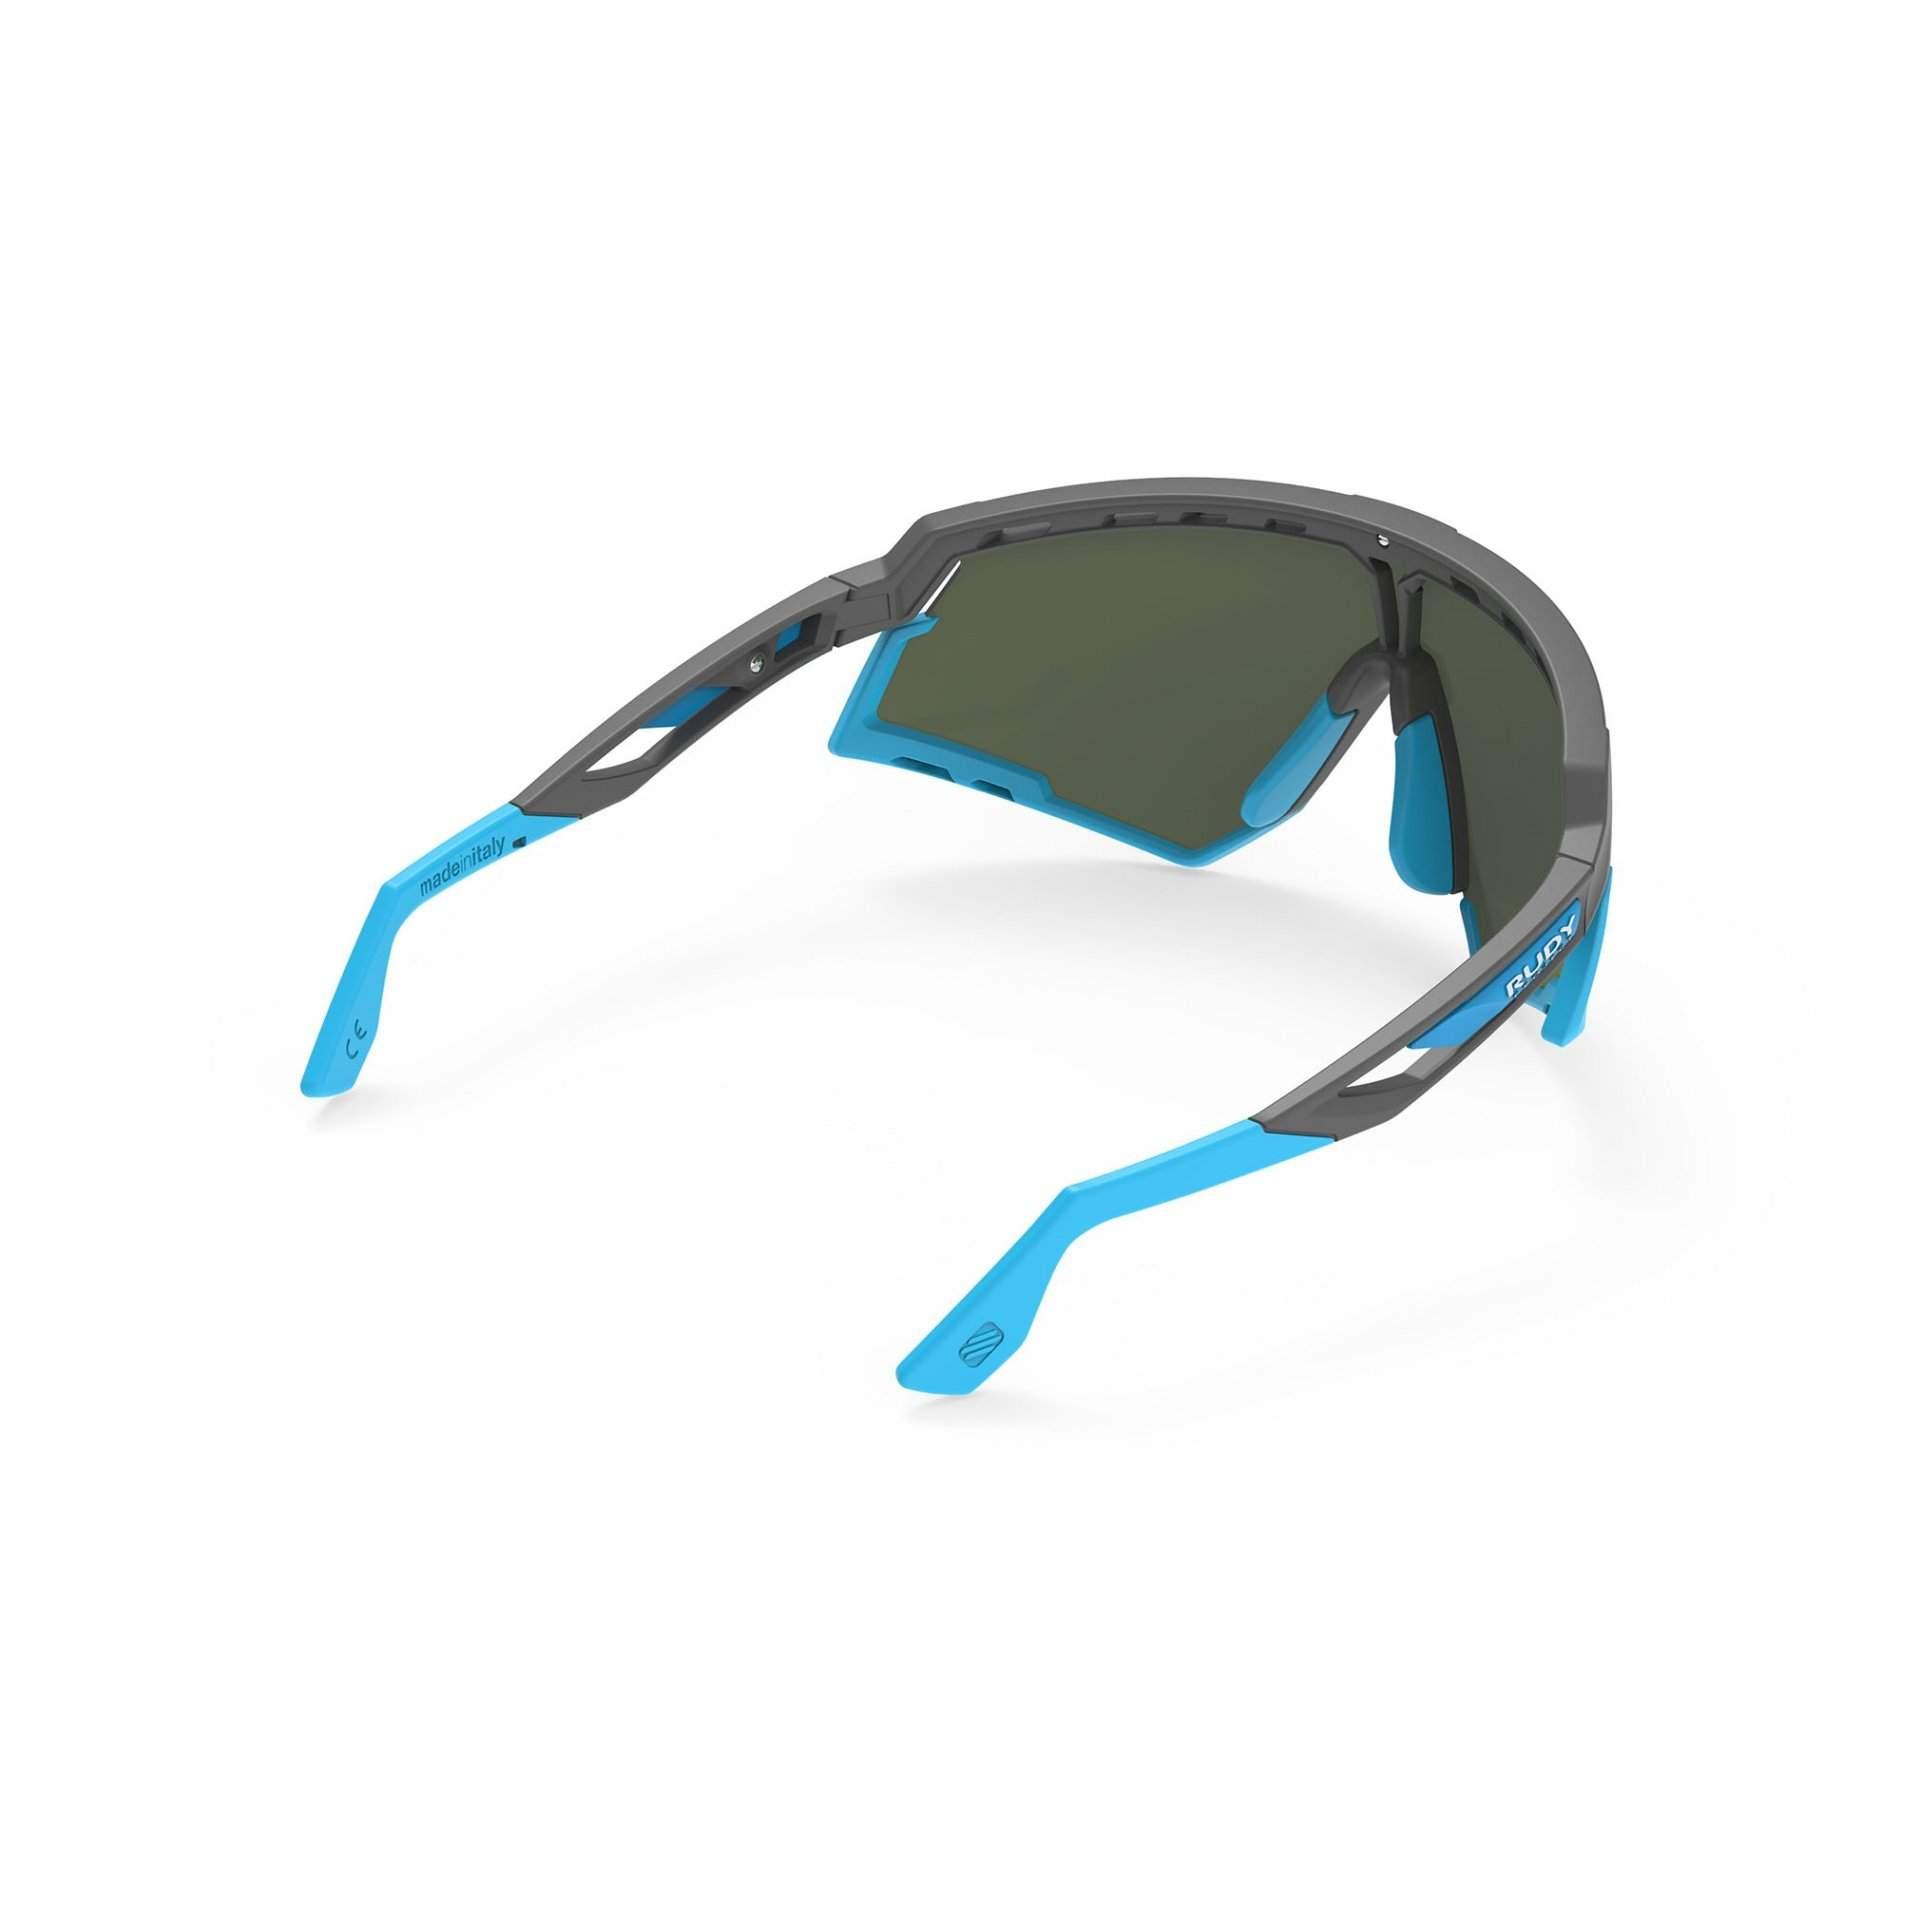 OKULARY RUDY PROJECT DEFENDER MULTILASER BLUE + GGREY BUMPERS AZUR SP5239750002 Z TYŁU